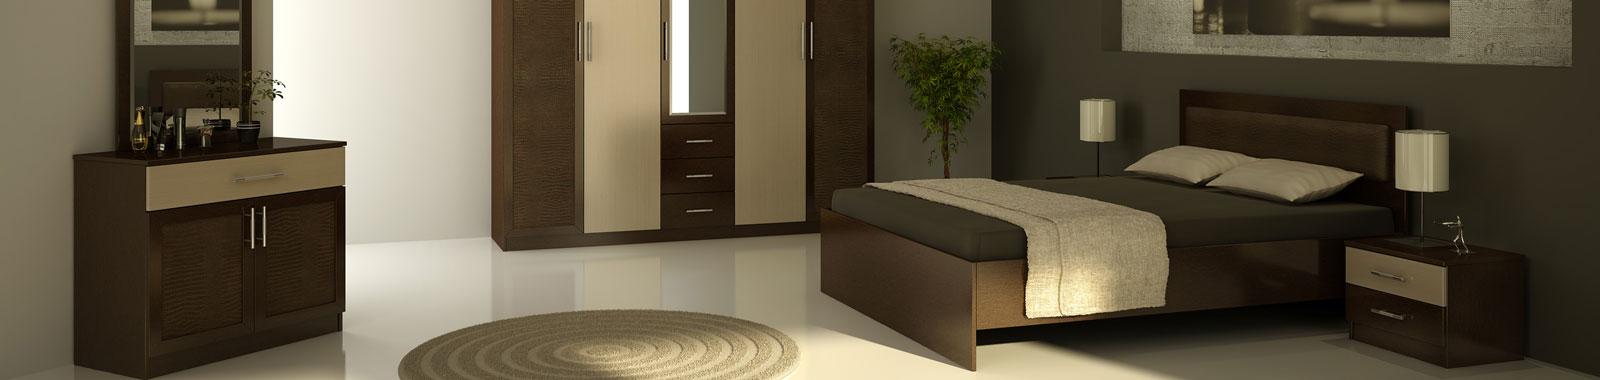 yatak-odasi-montaj-2